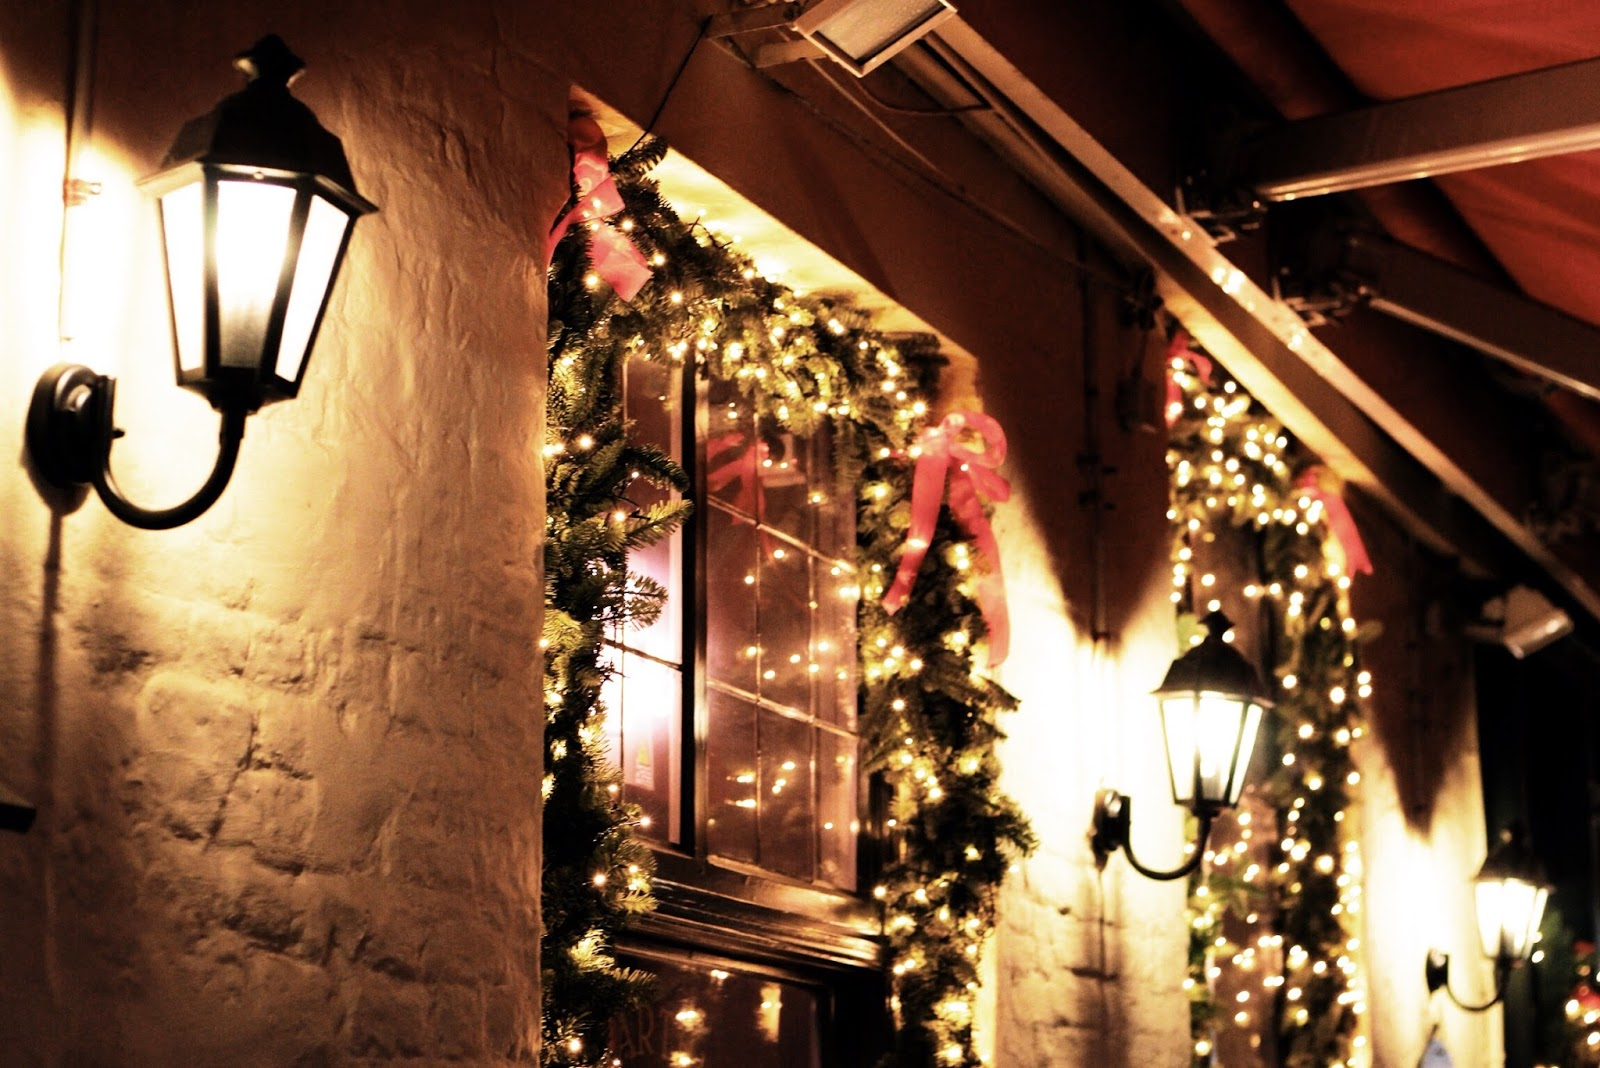 Romantic Christmas decorations in Bruges around windows